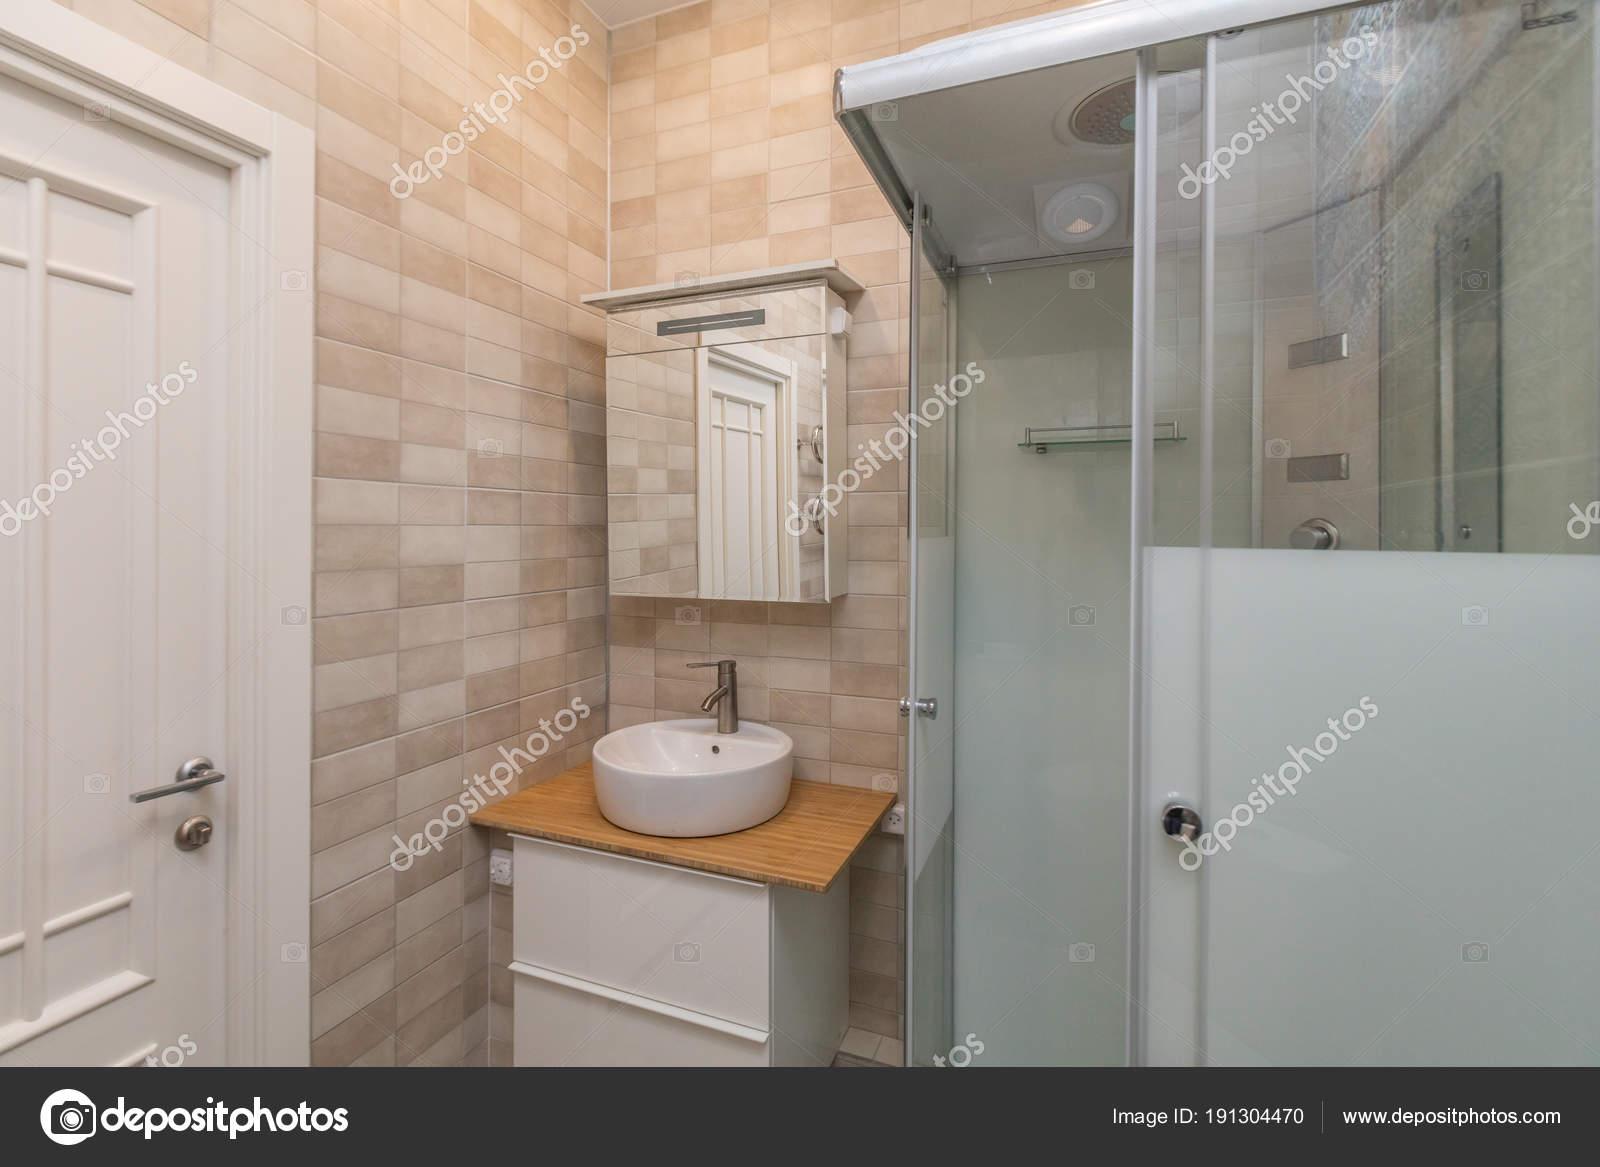 Marmer Tegels Badkamer : Badkamer tegels beige badkamer inspiratie tegelmaxx